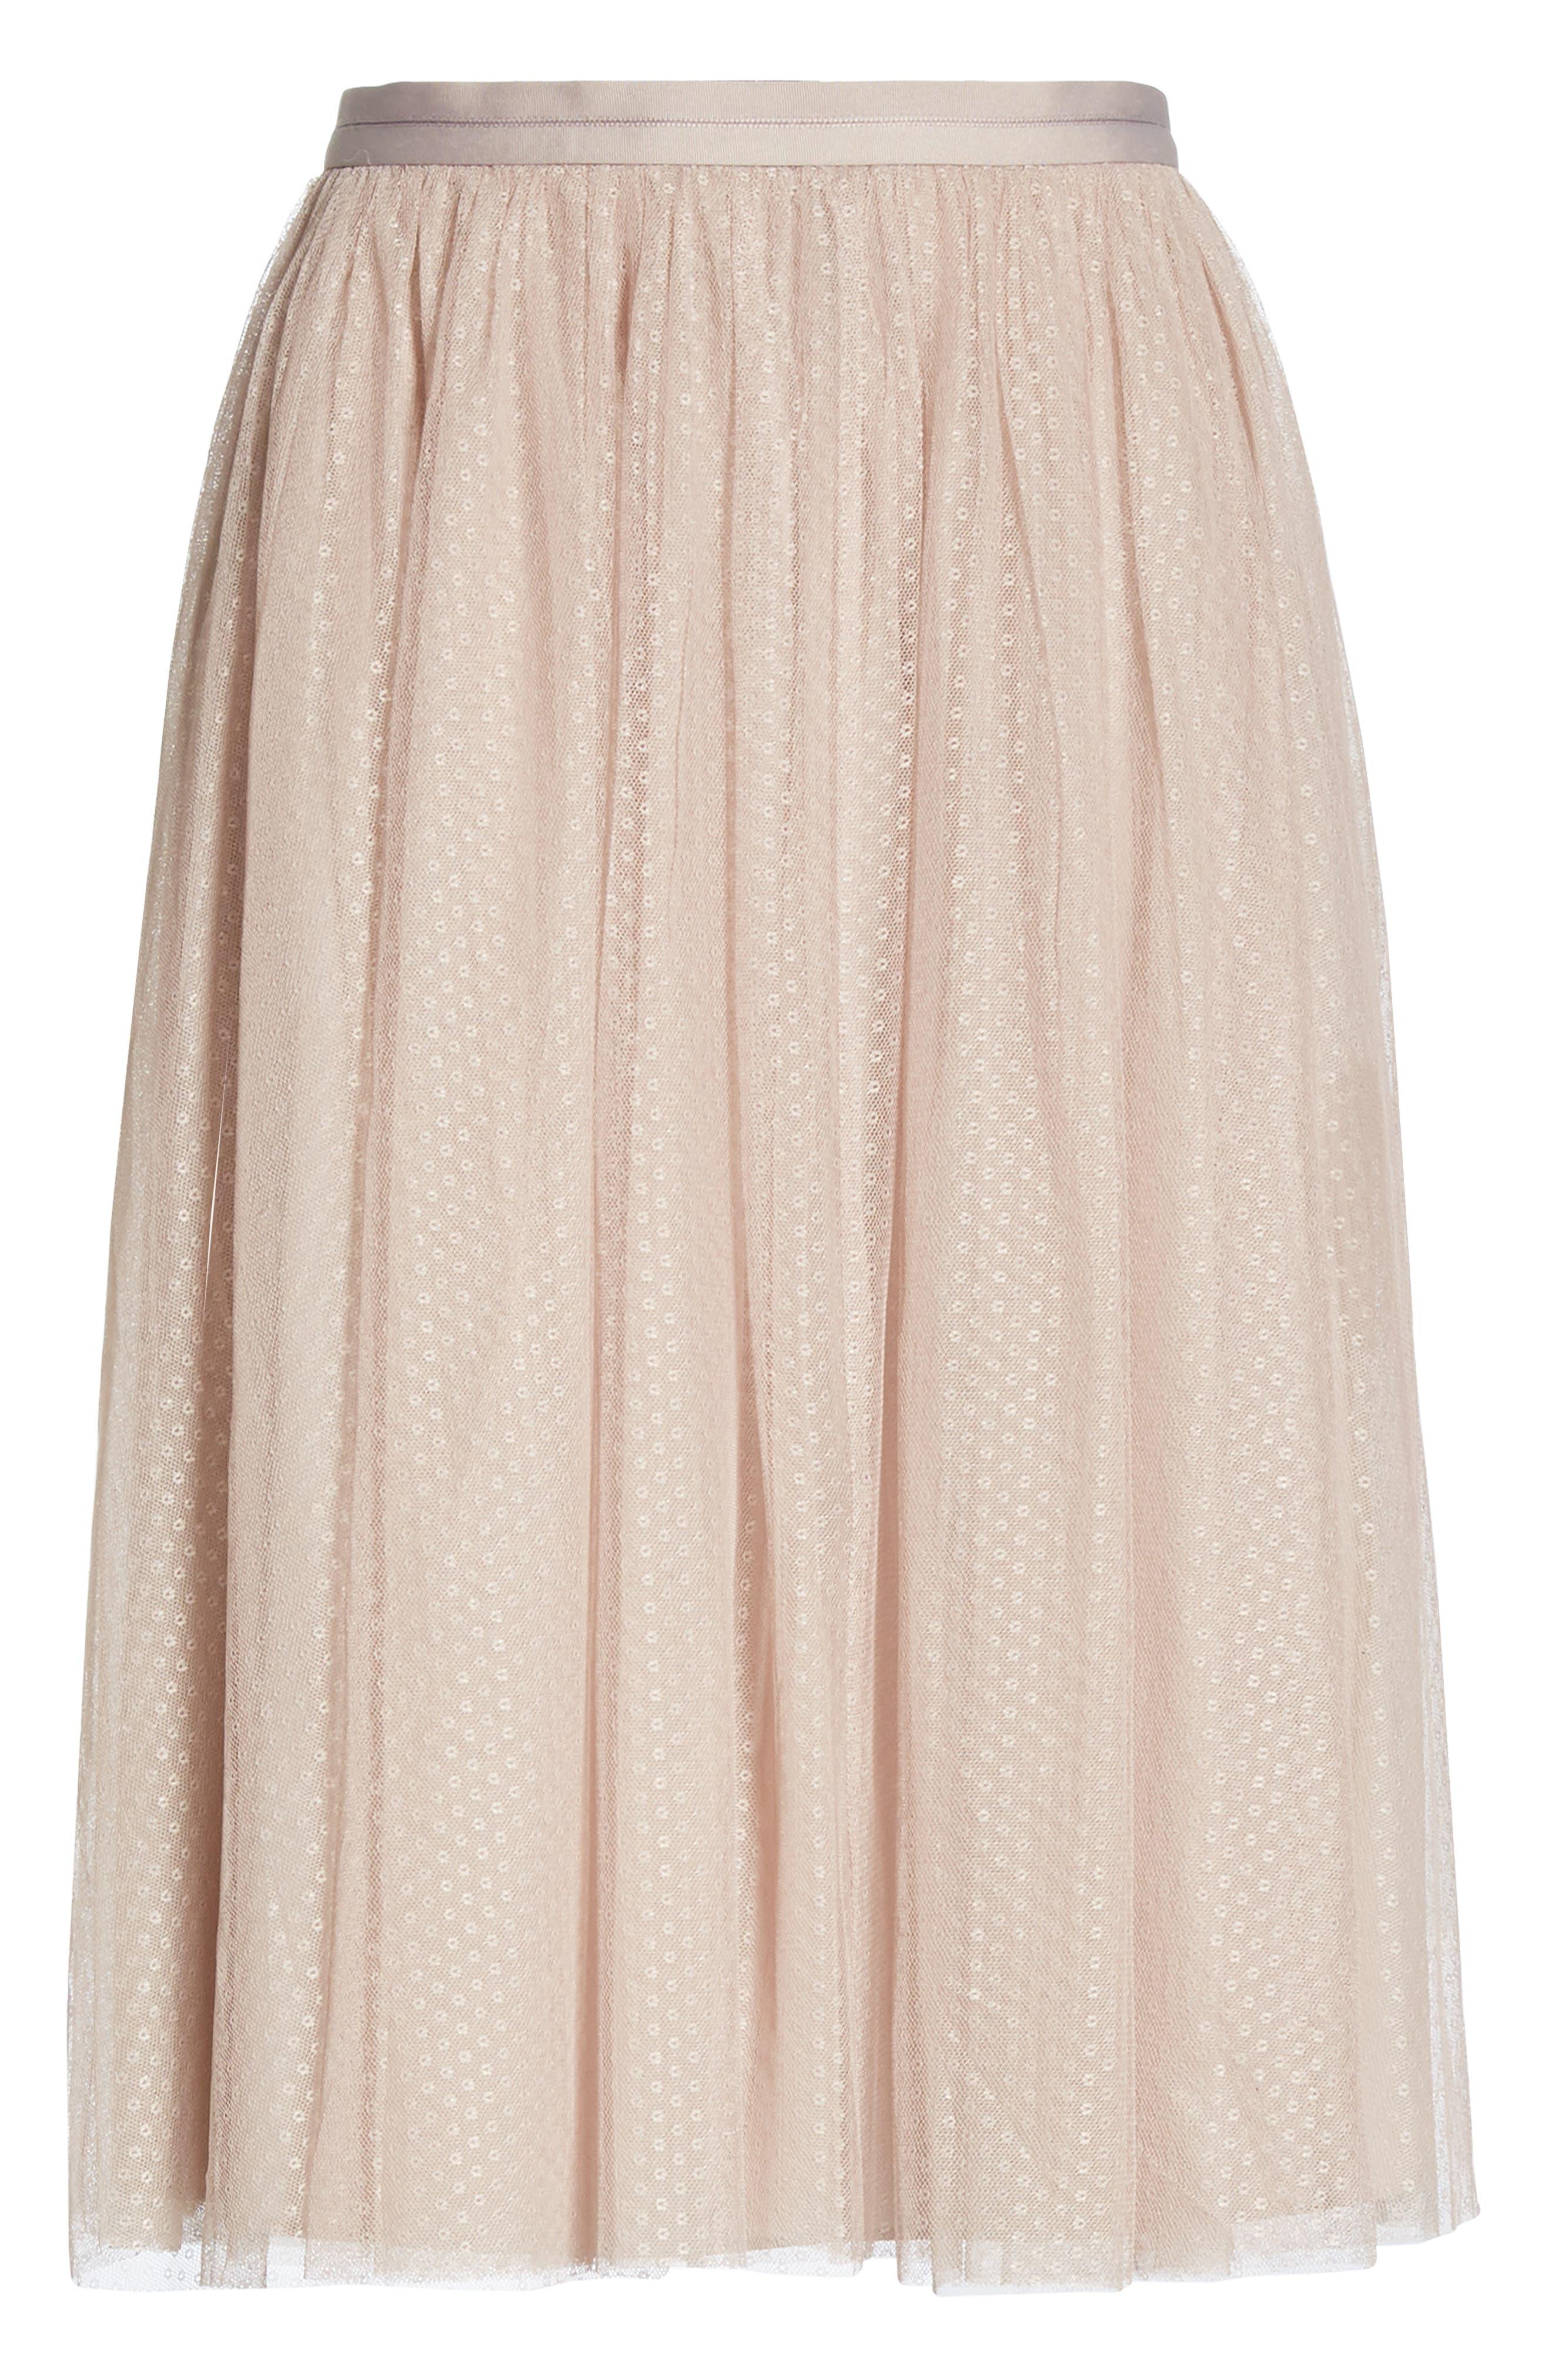 Dotted Tulle A-Line Skirt,                             Alternate thumbnail 6, color,                             DUSK ROSE